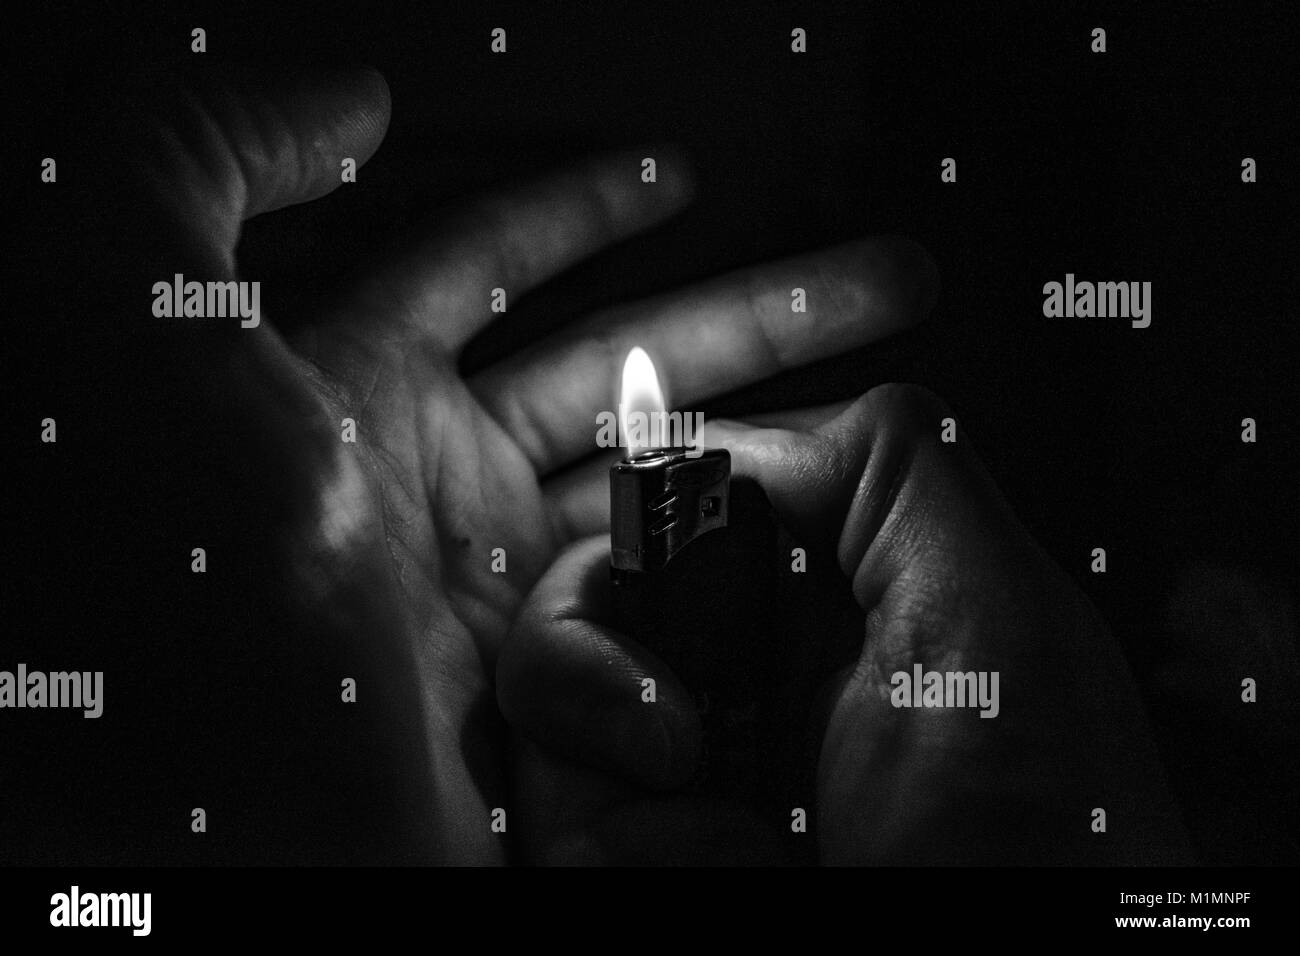 Man hands lights a lighter in the dark - Stock Image